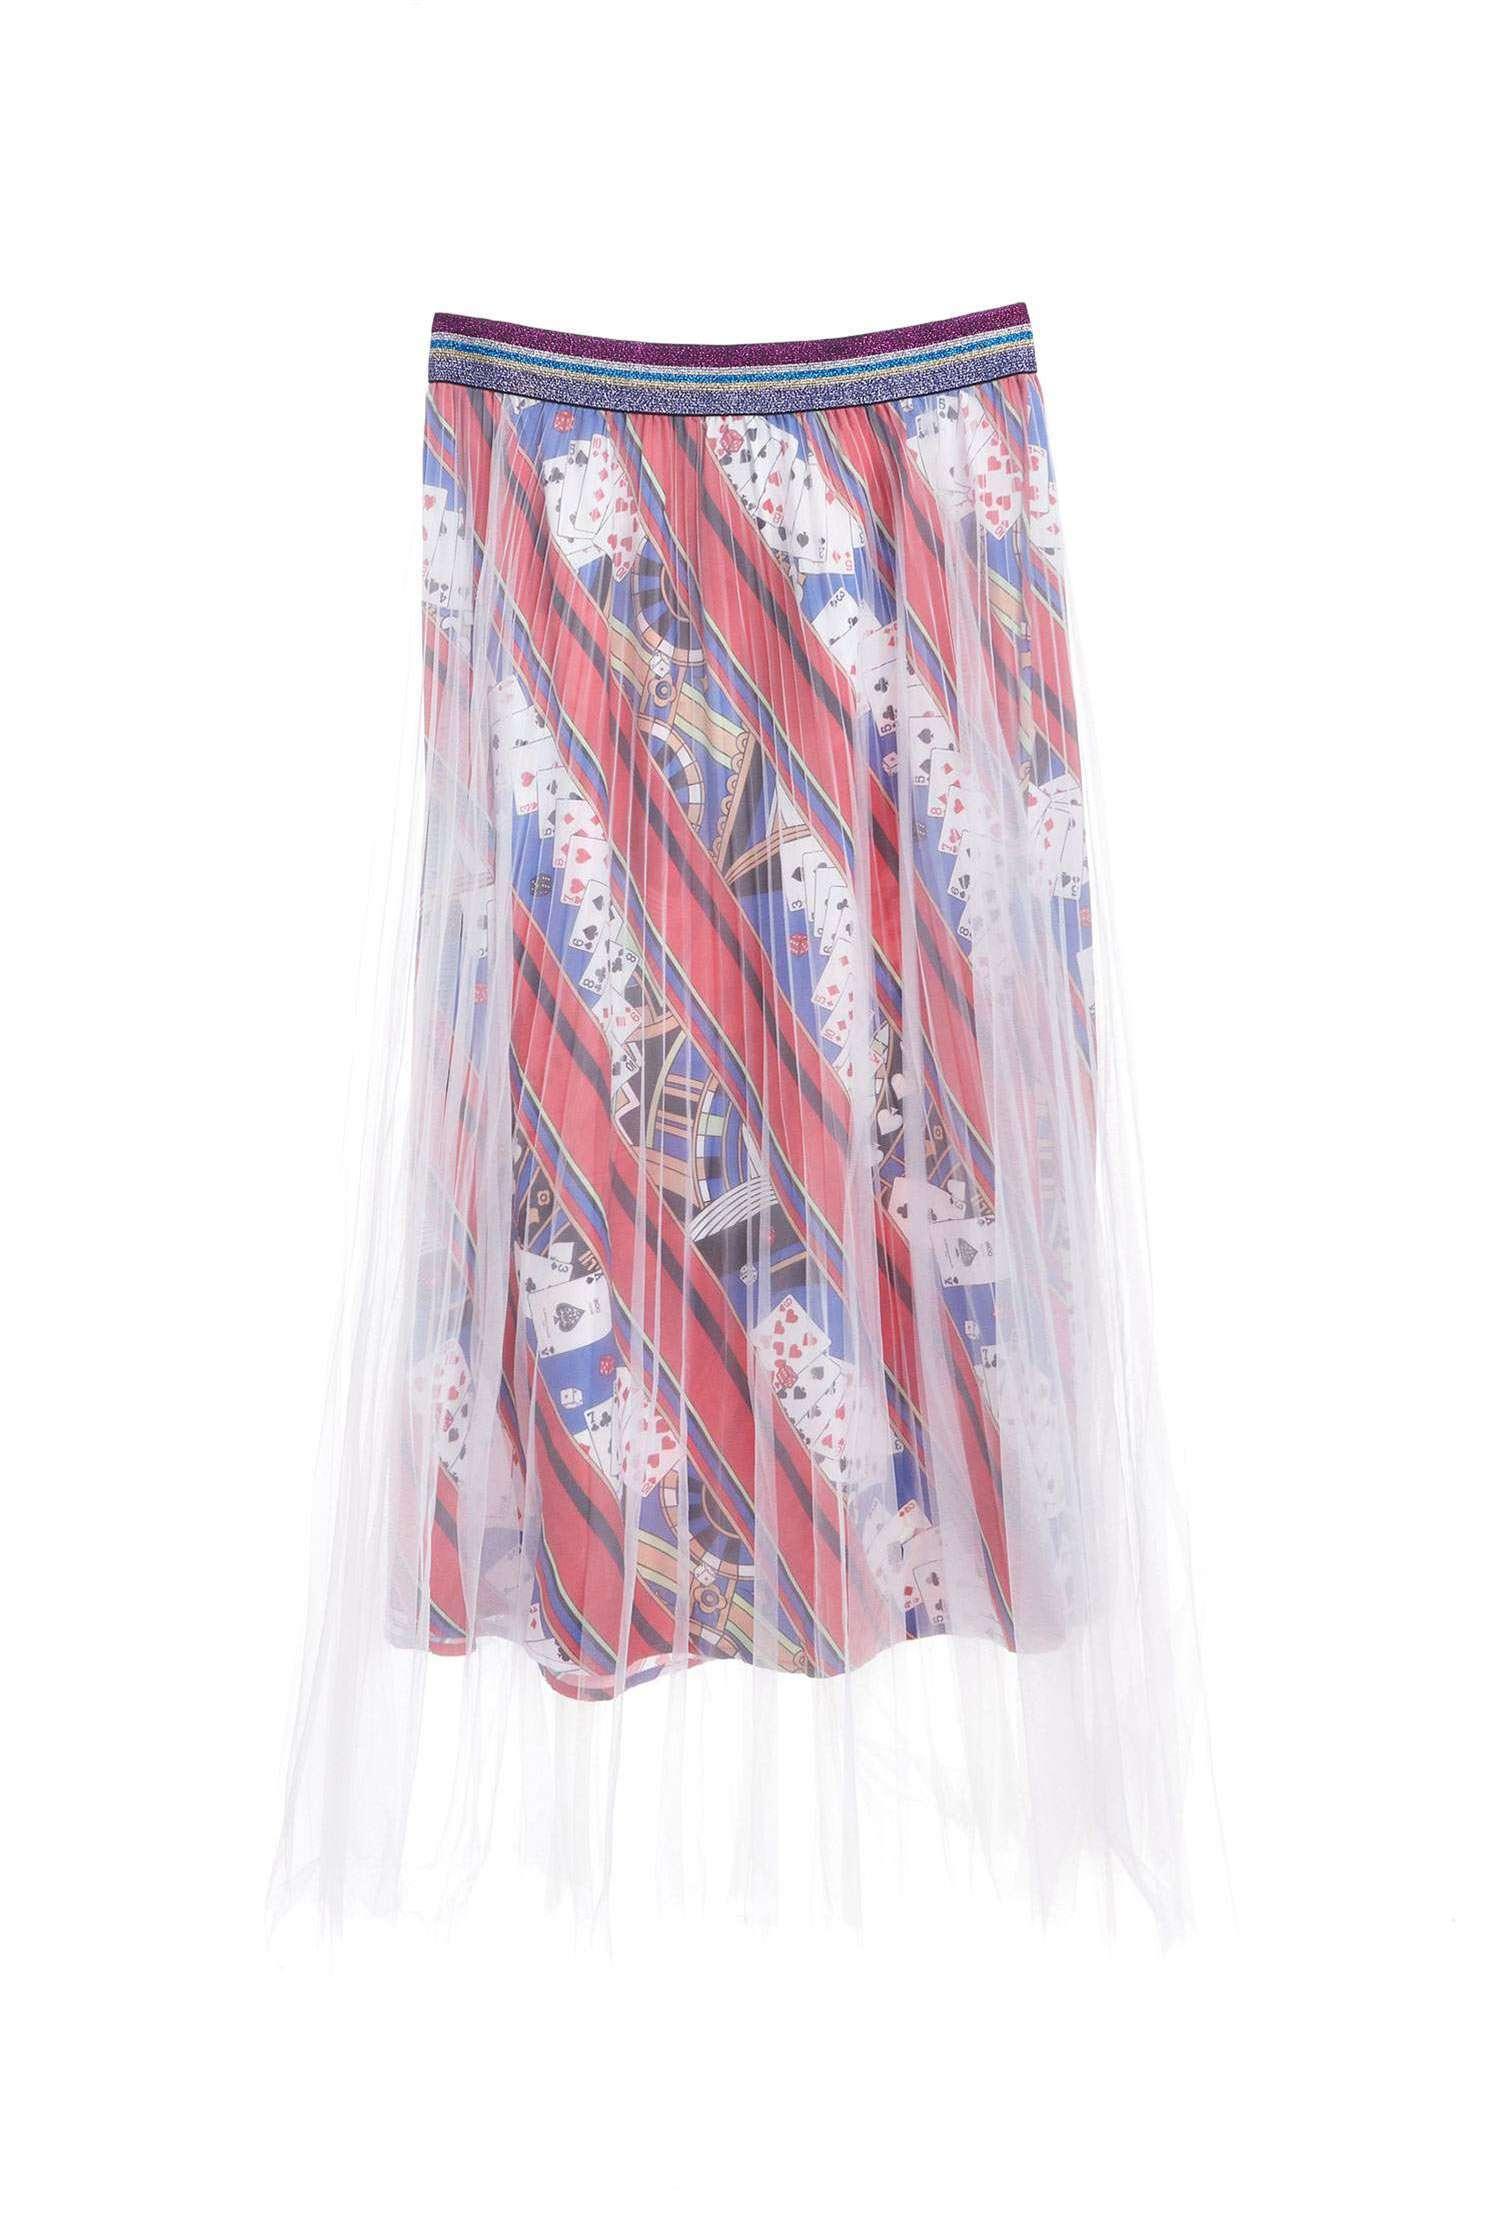 Popular fashion long skirt